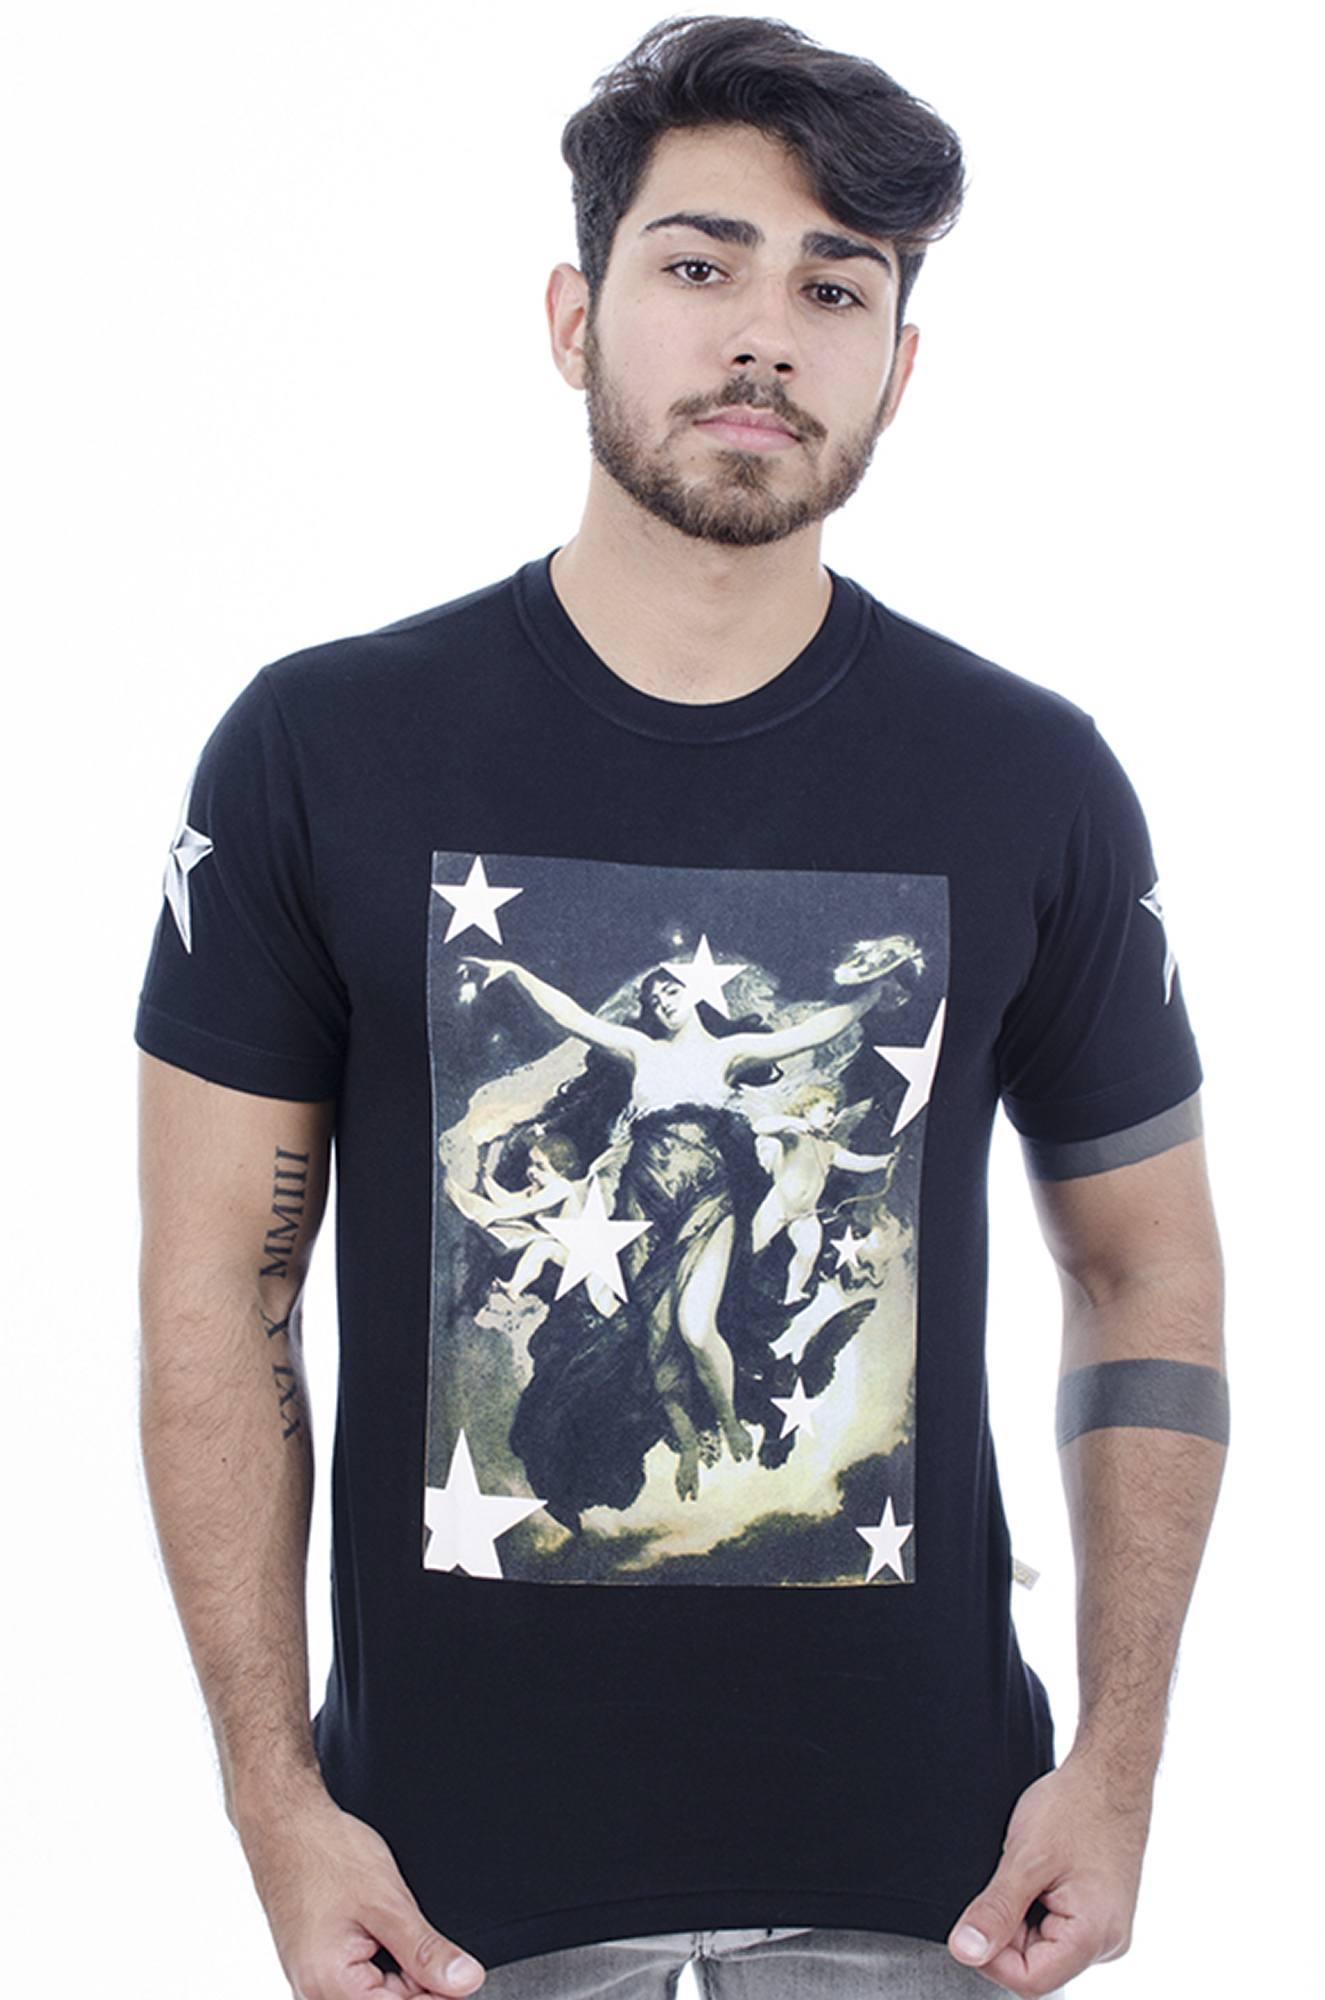 Camiseta Masculina Estampada Hardivision Lady Of Stars Preto